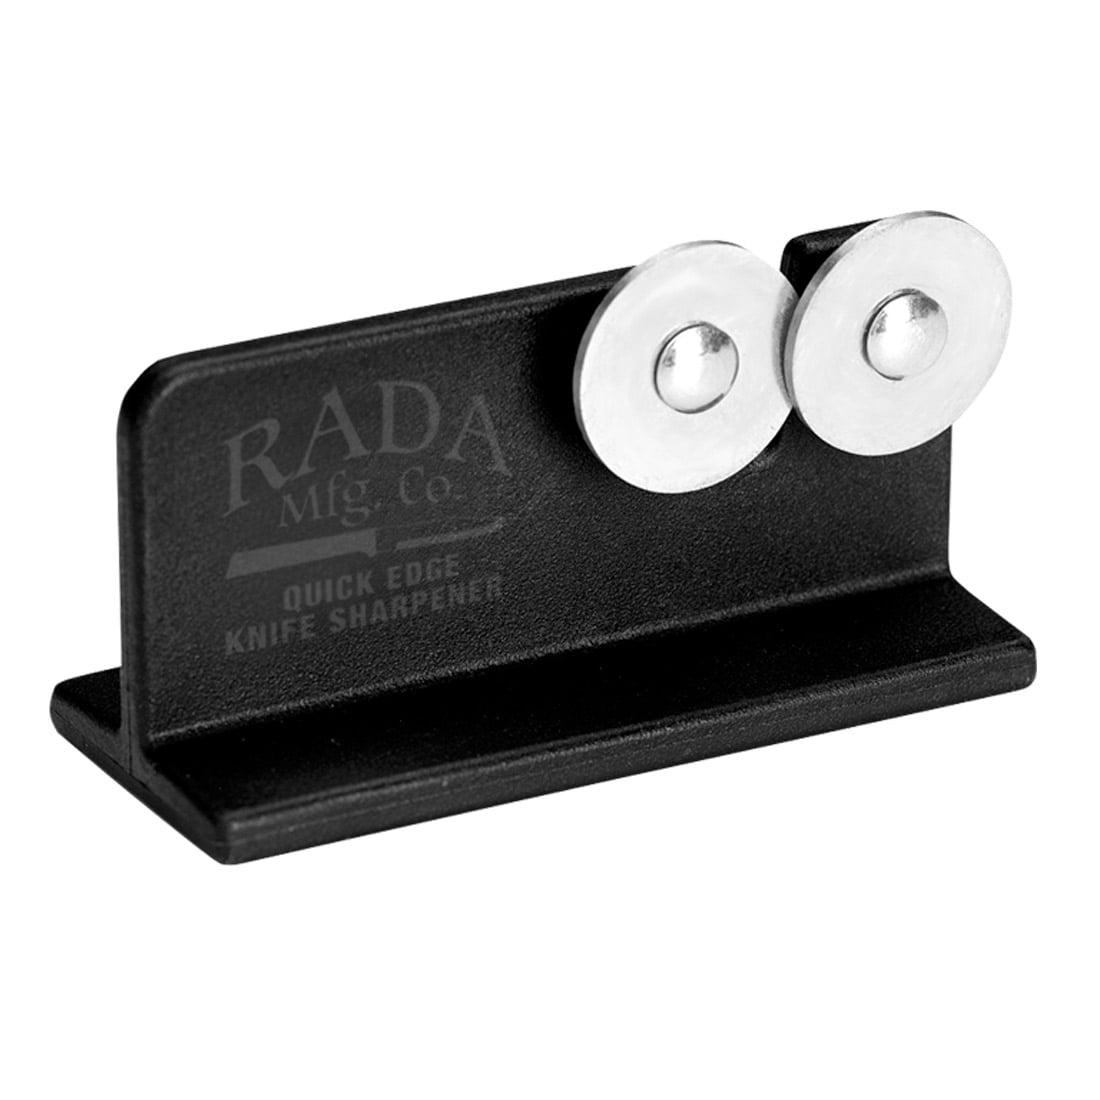 Rada Cutlery Quick Edge Knife Sharpener – Stainless Steel Wheels